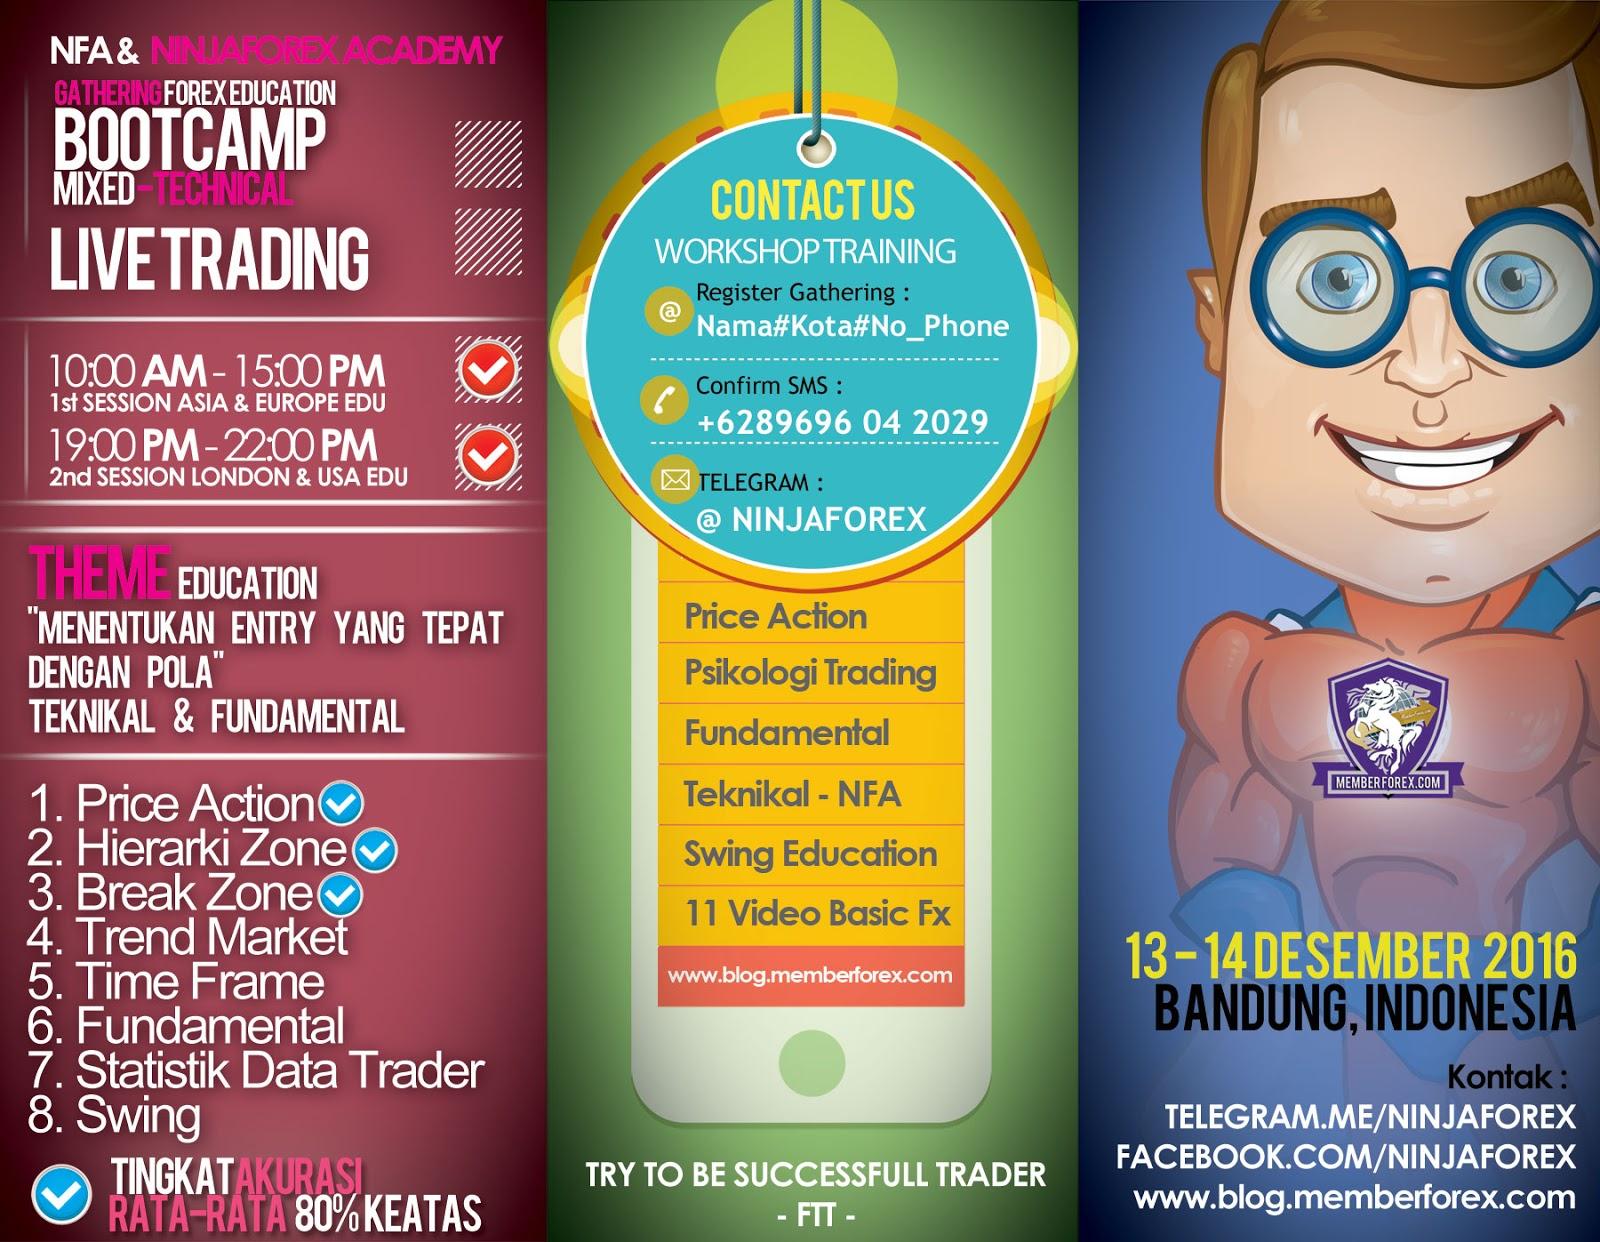 Forex academy indonesia